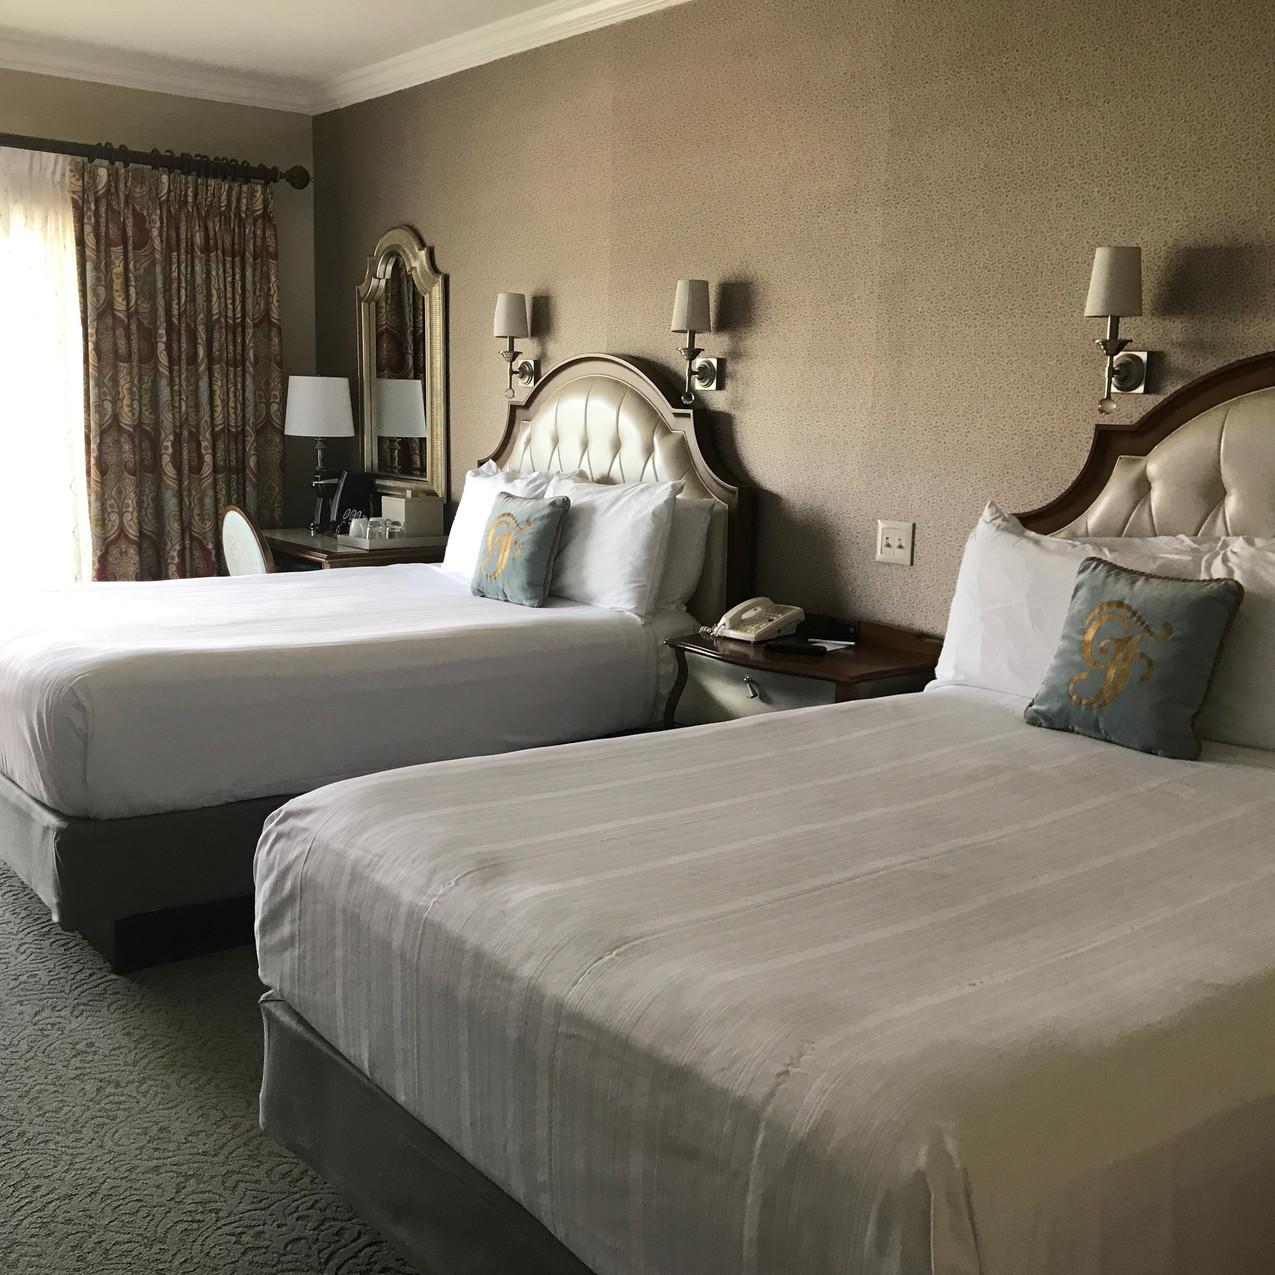 Two comfortable queen beds